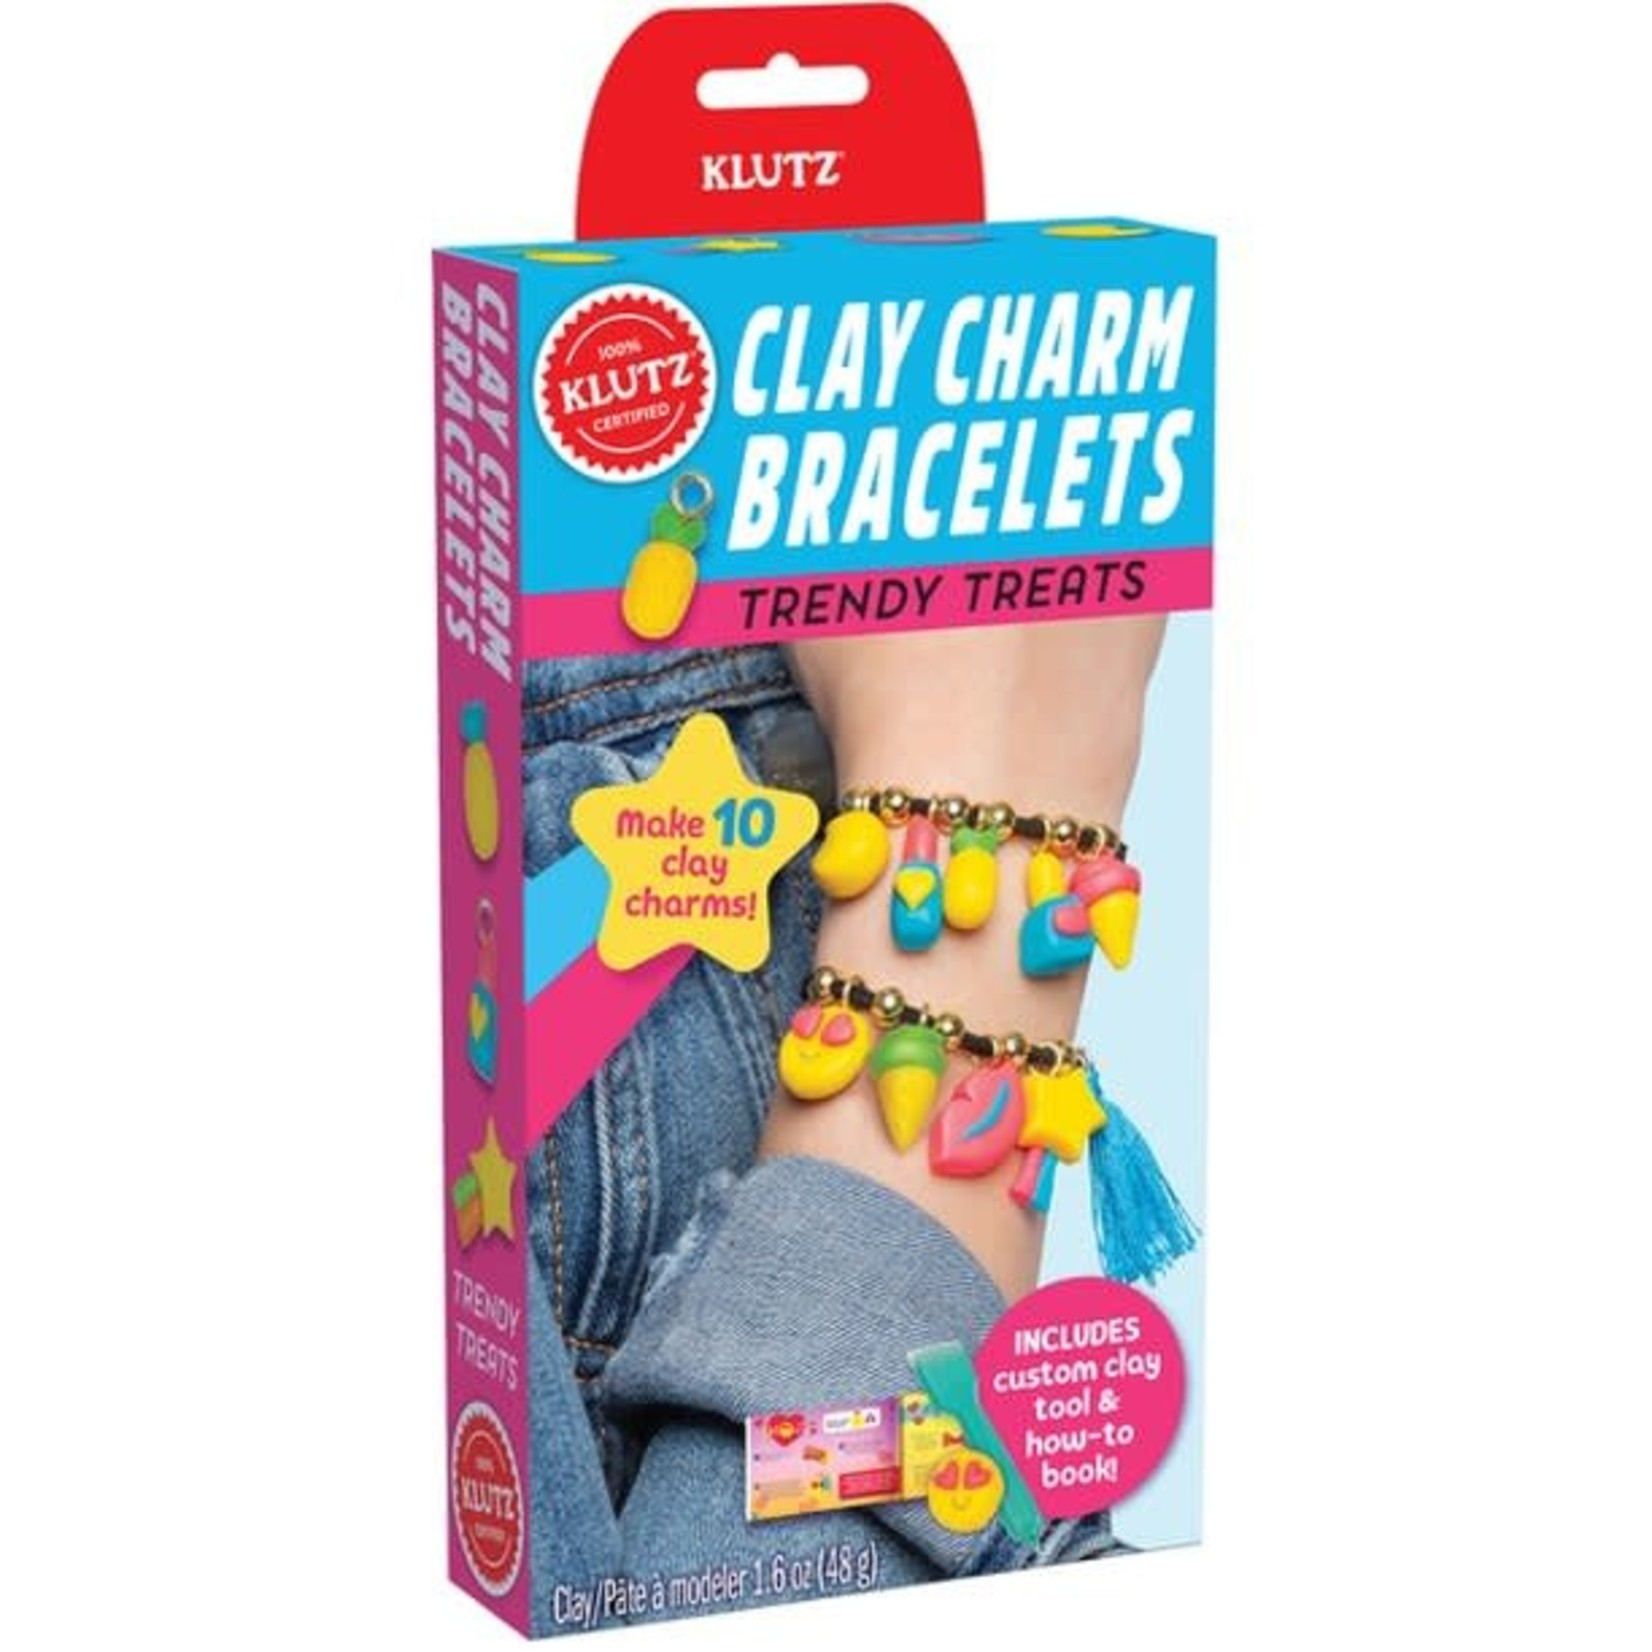 Klutz Clay Charm Bracelets - Trendy Treats